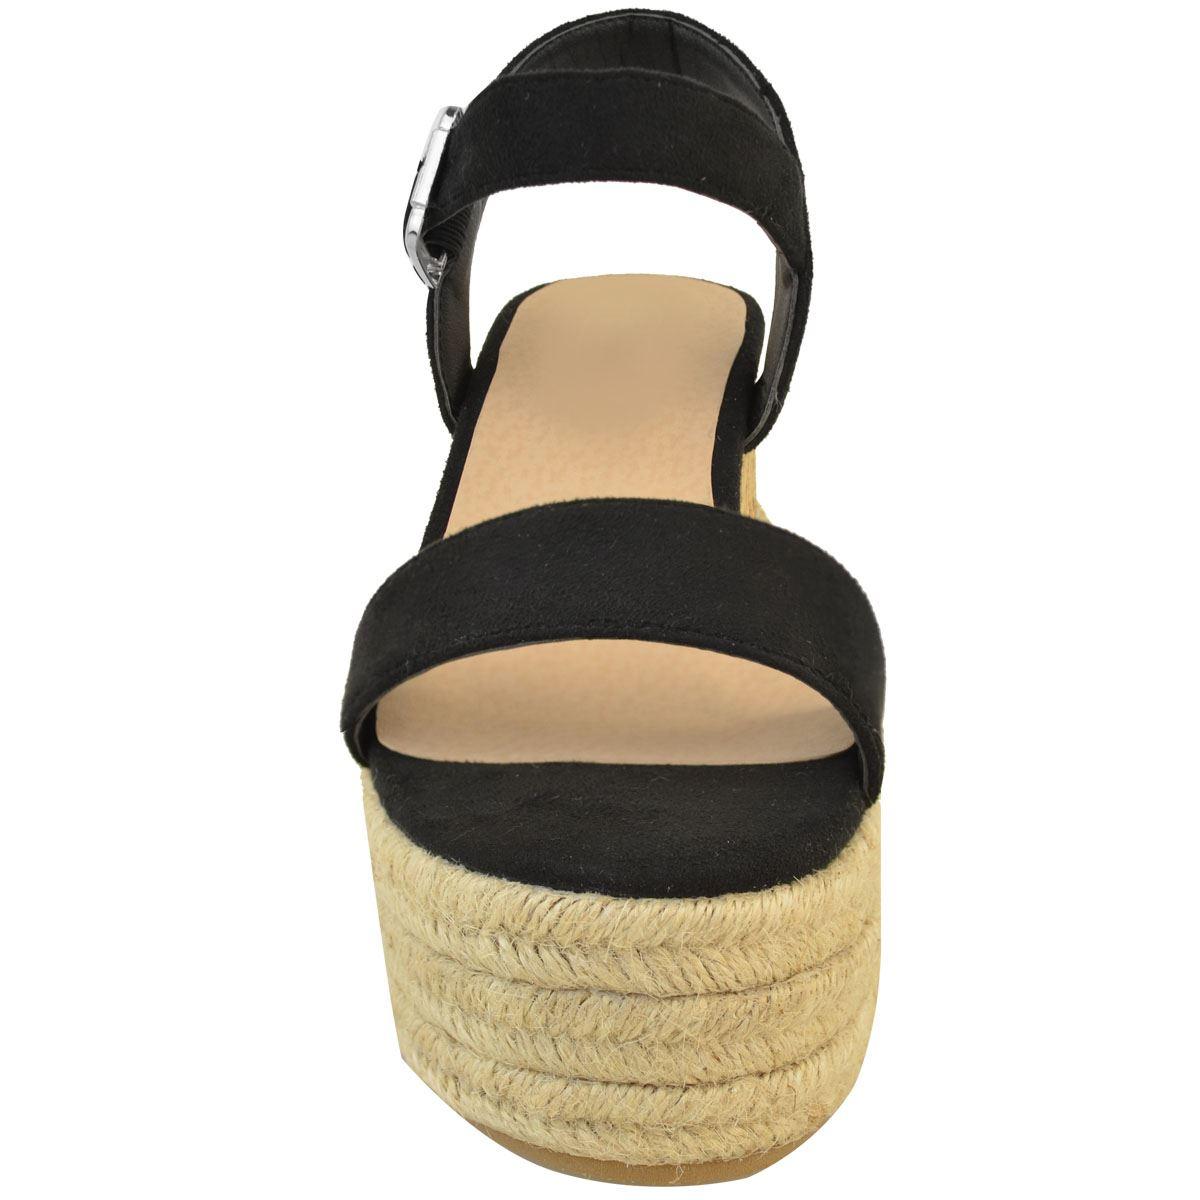 Womens Ladies Low Cork Wedge Platform Sandals Summer Espadrilles Comfort Size